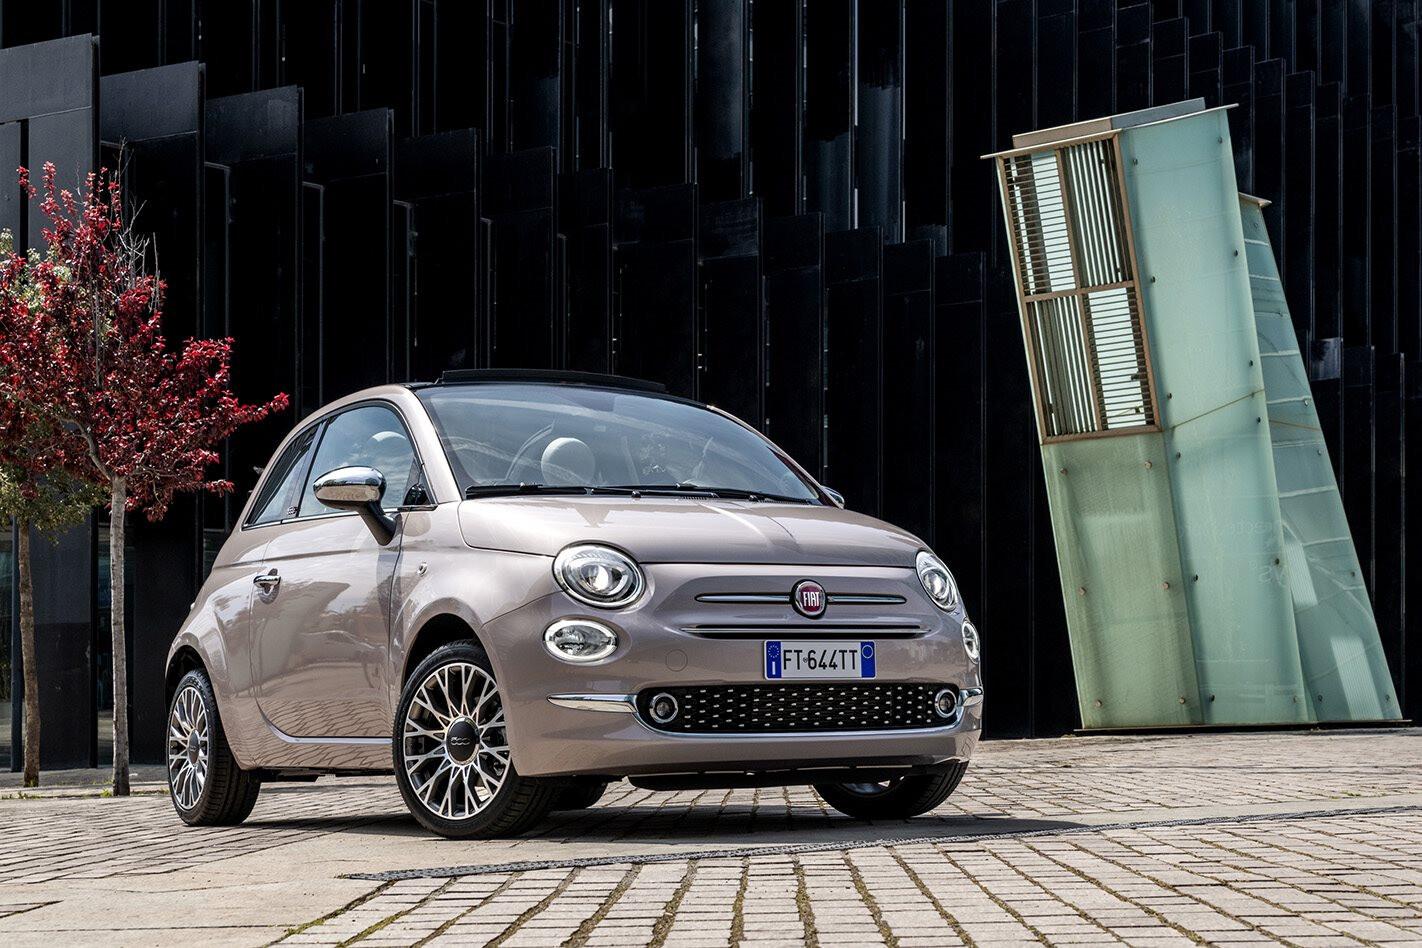 2020 Fiat 500 Club